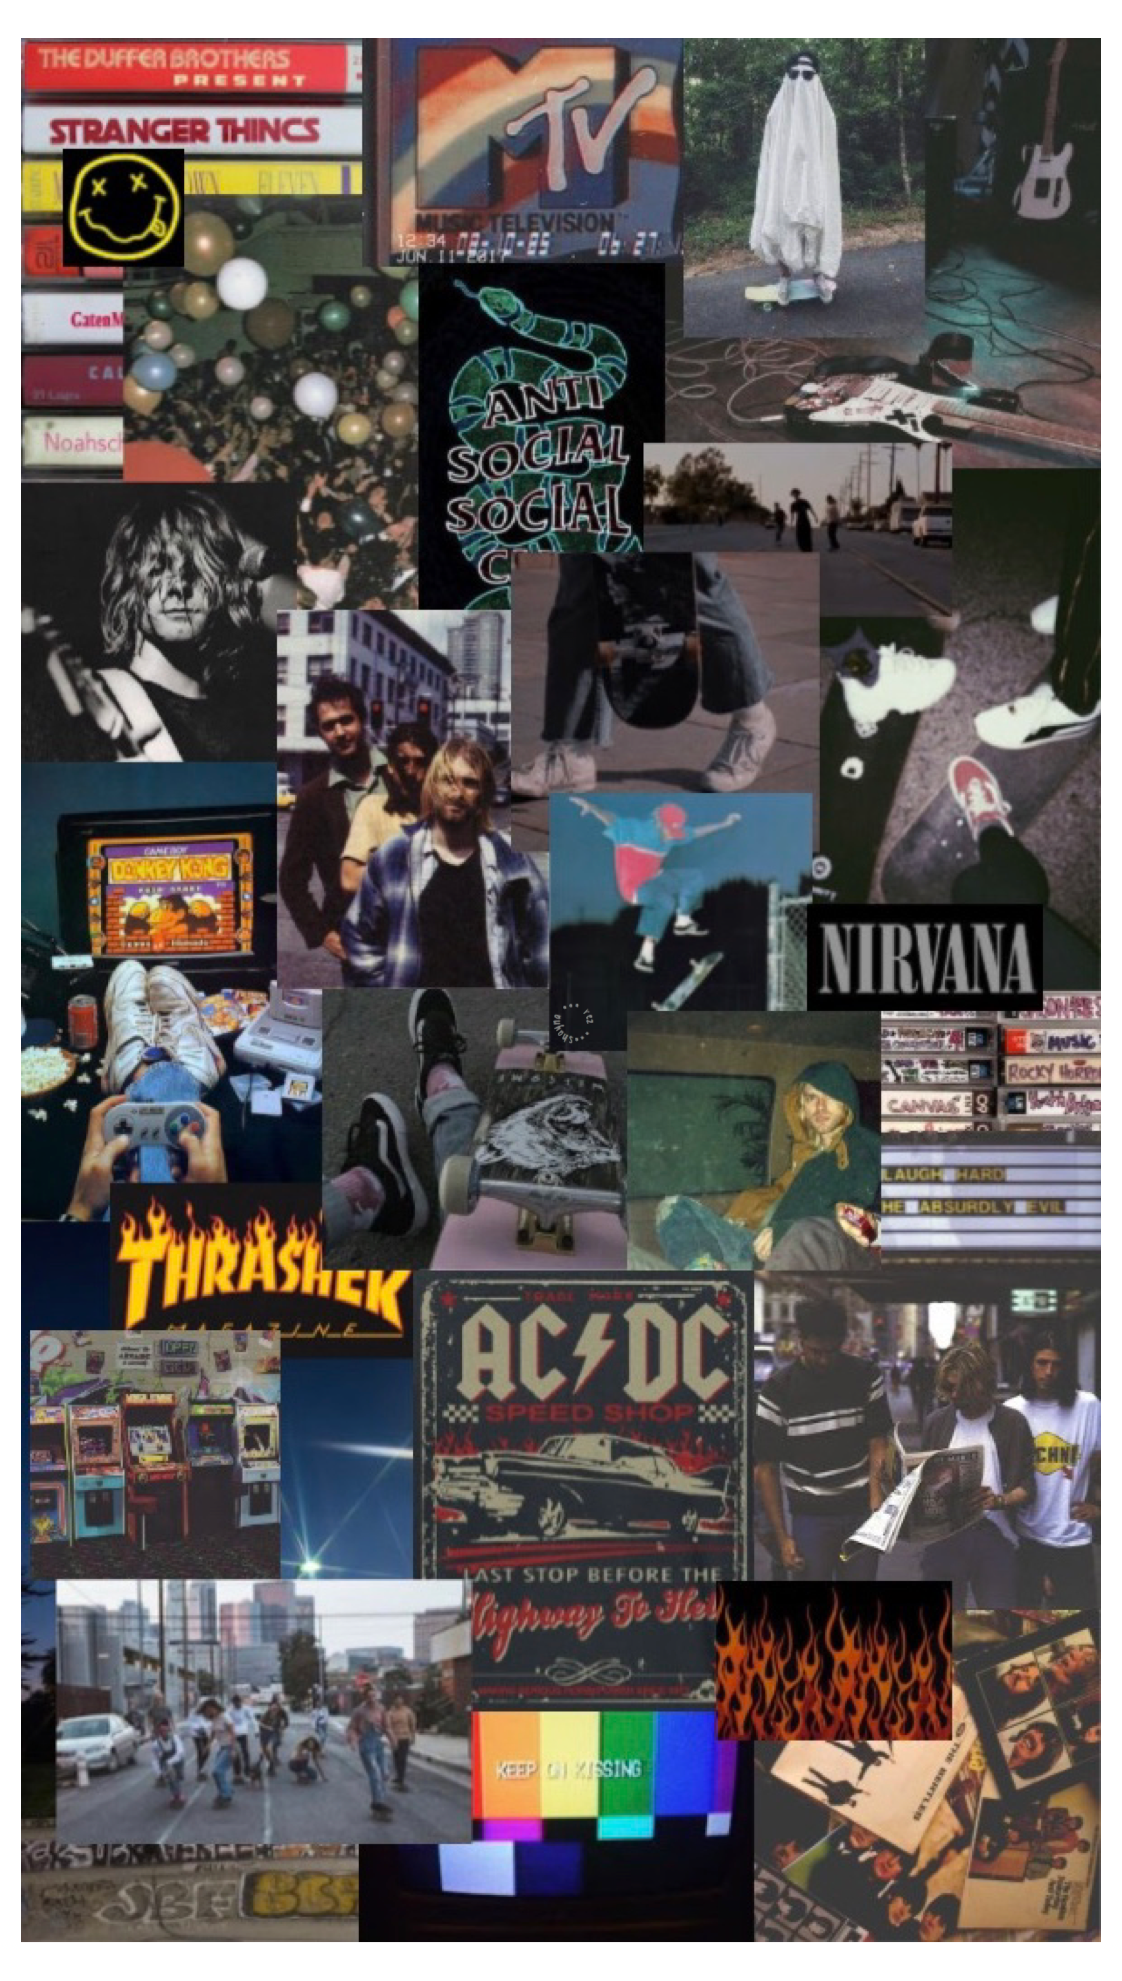 90s aesthetic wallpaper iphone grunge